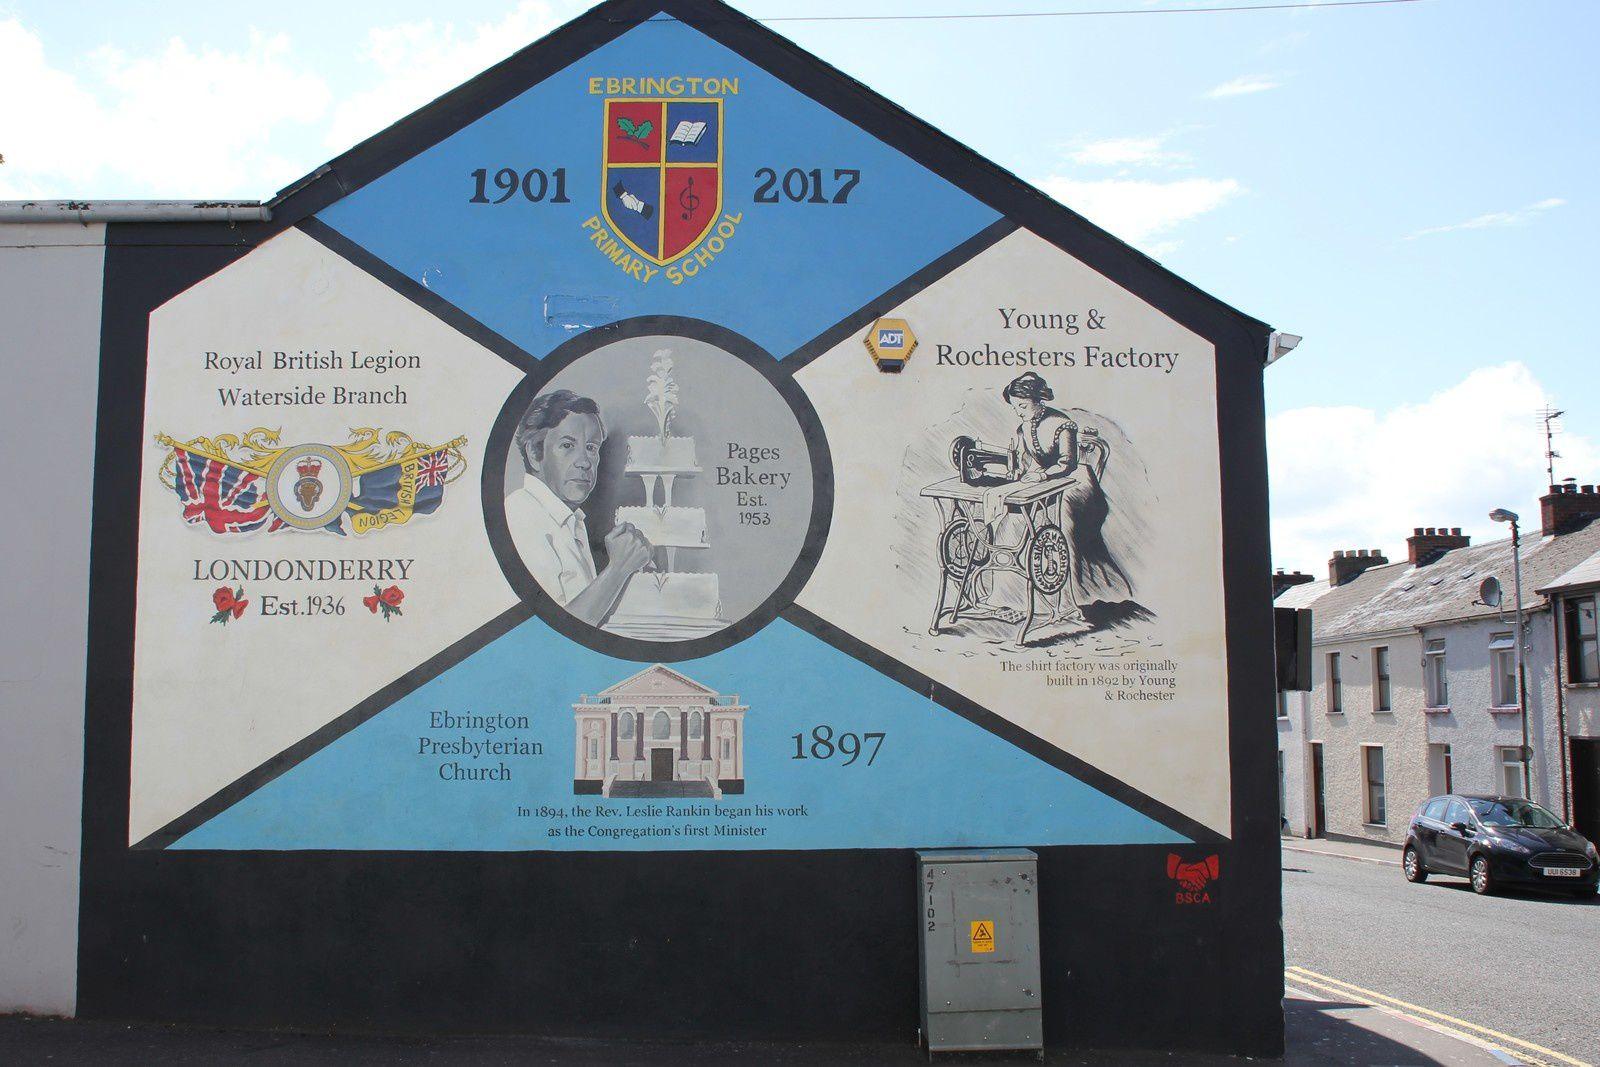 750) Bonds Street, Waterside, Derry